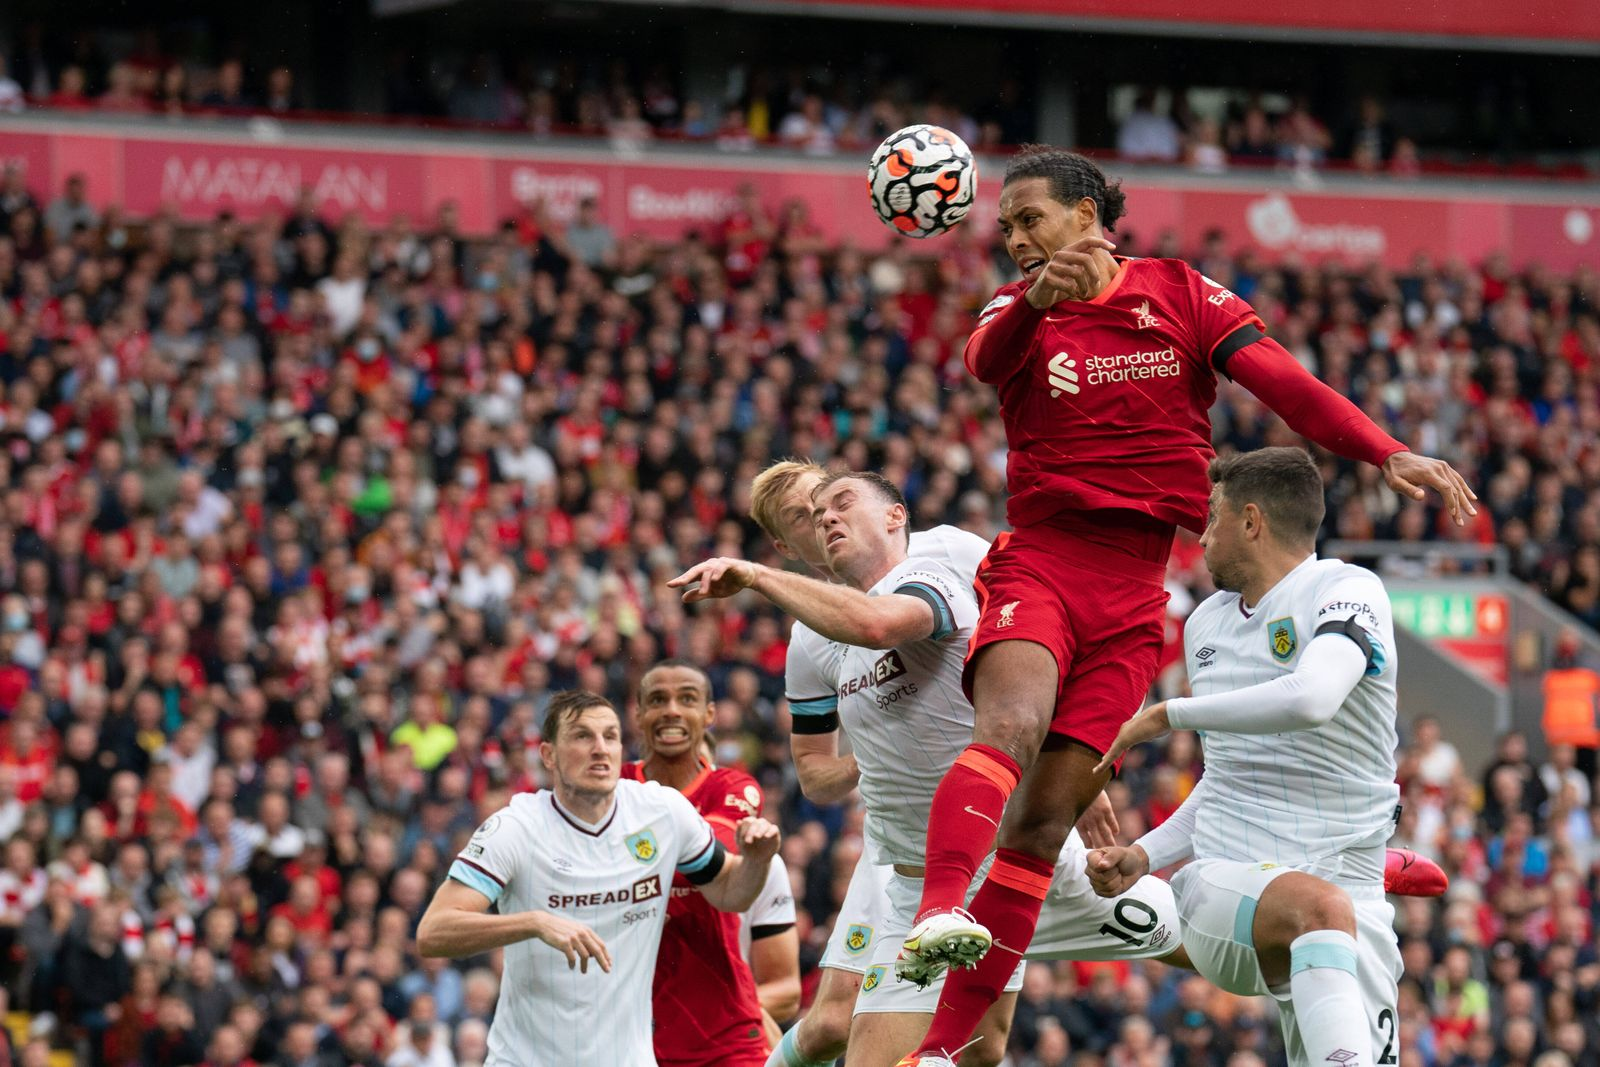 Football - 2021 / 2022 Premier League - Liverpool vs Burnley - Anfield - Saturday 21st August 2021 Liverpool s Virgil va